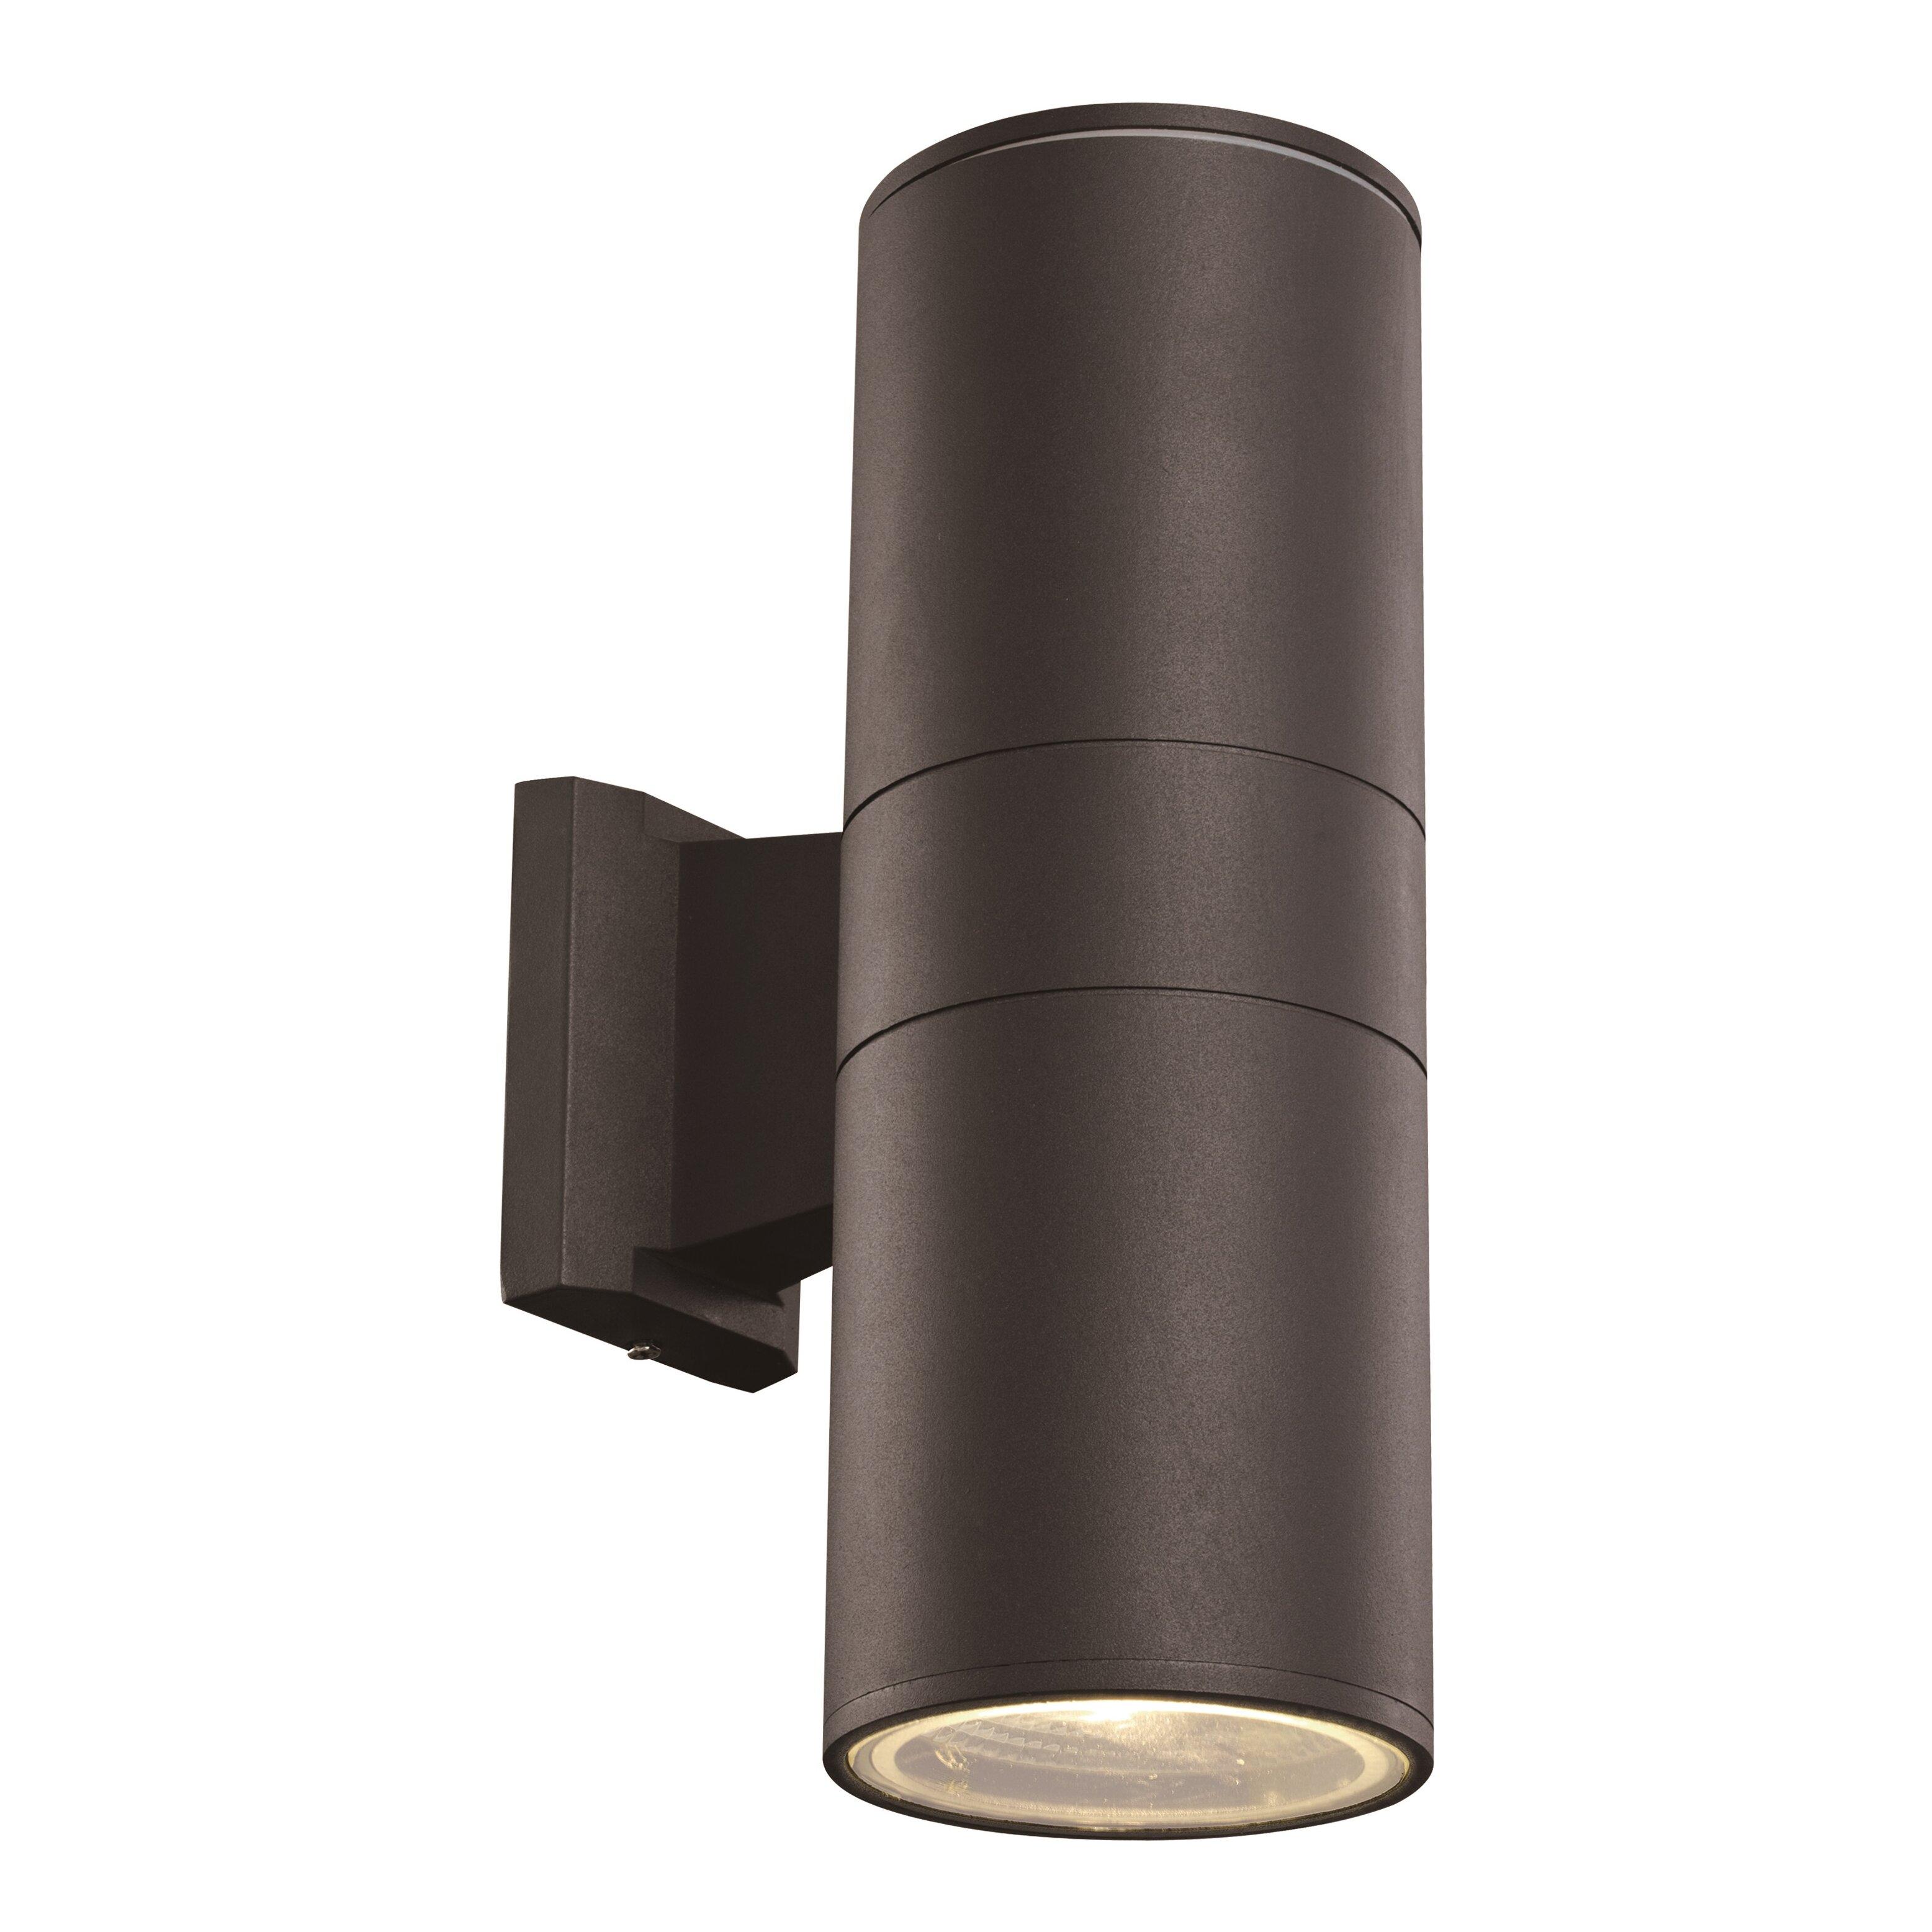 Transglobe Lighting Compact 1 Light Dual Wall Sconce Wayfair